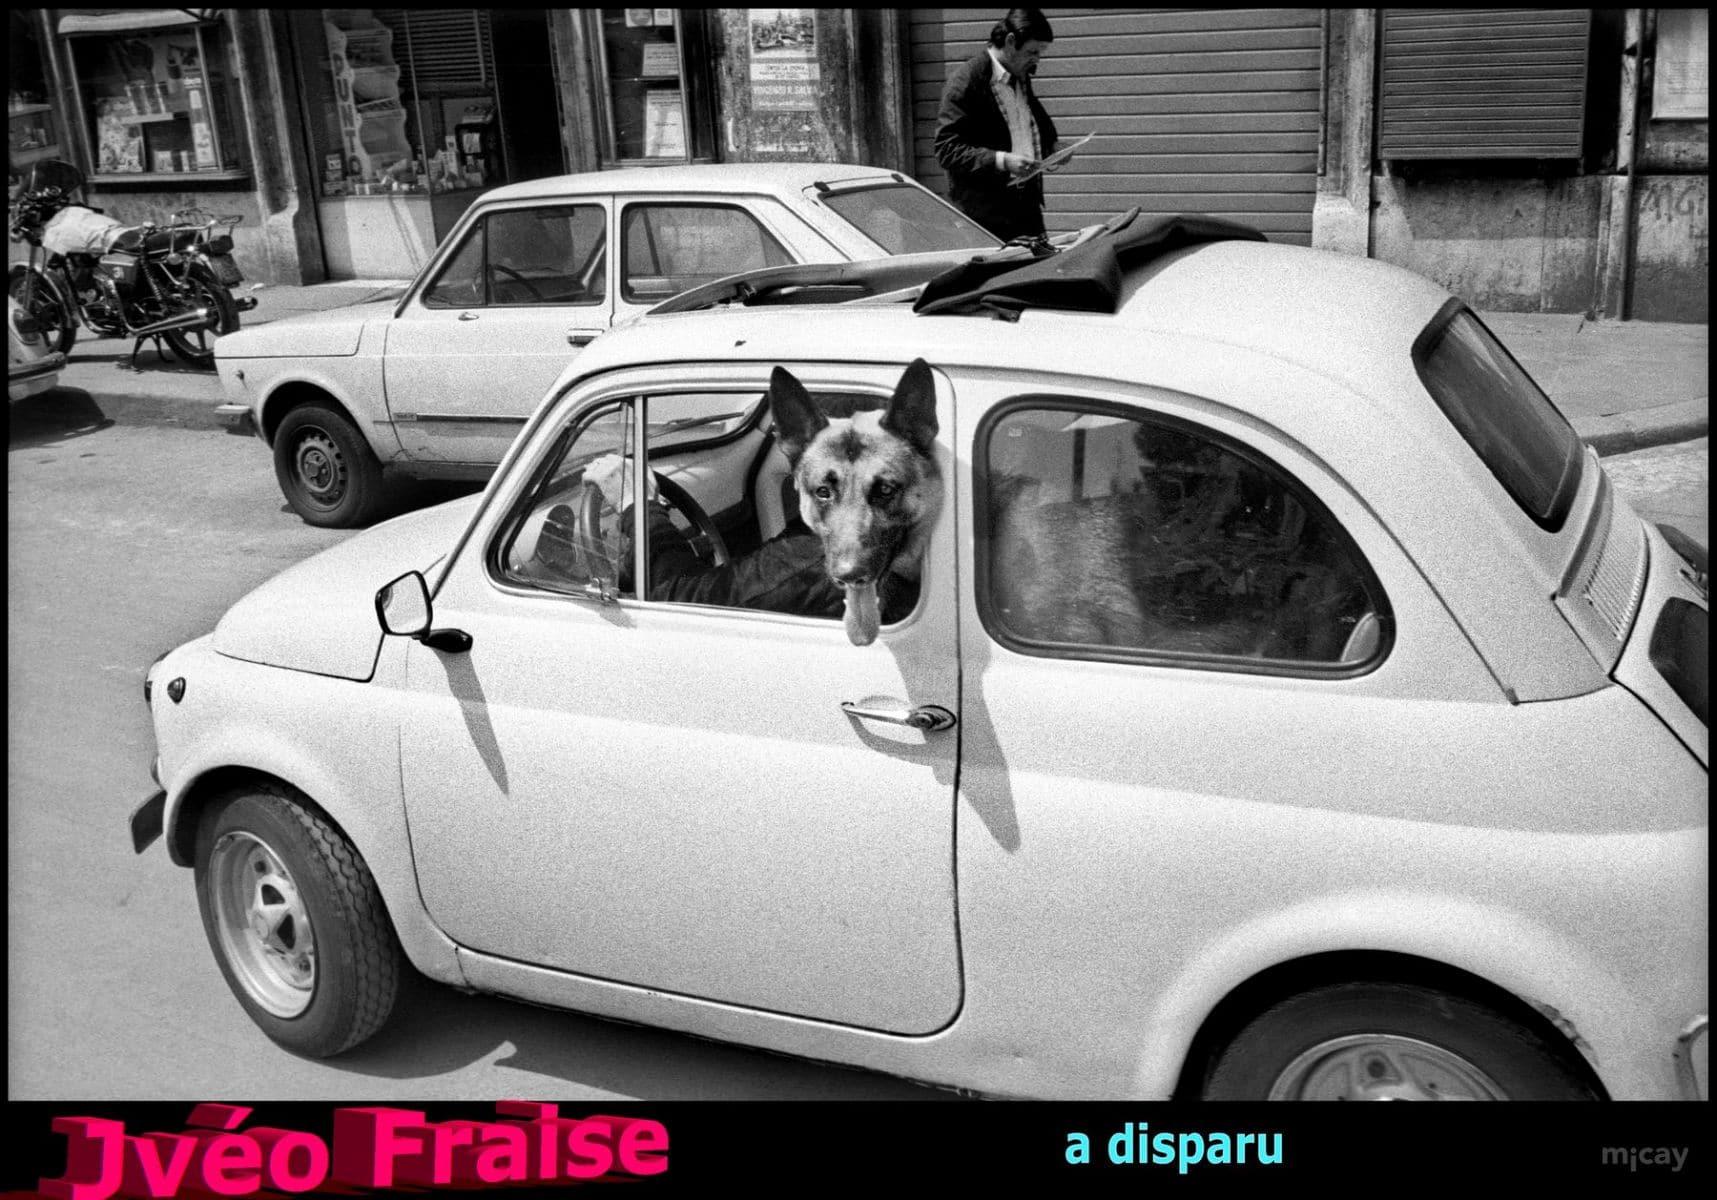 MichelAycaguer-JveoFraise-streetphotography-23